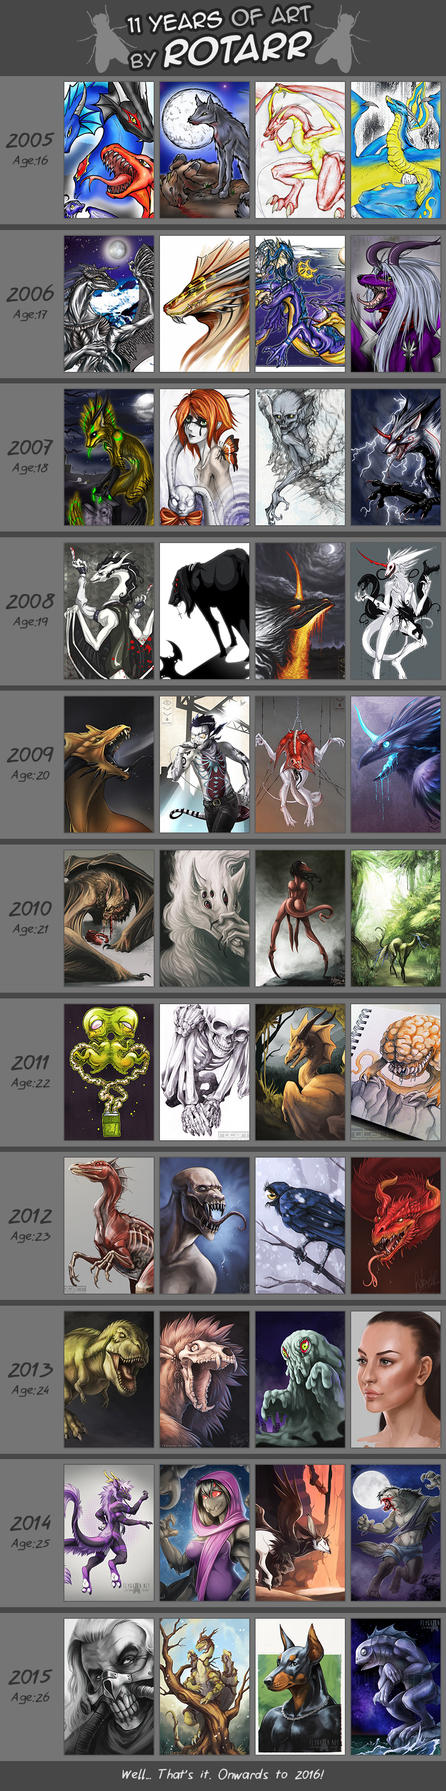 Improvement Meme - 11 years of Art by FlyQueen